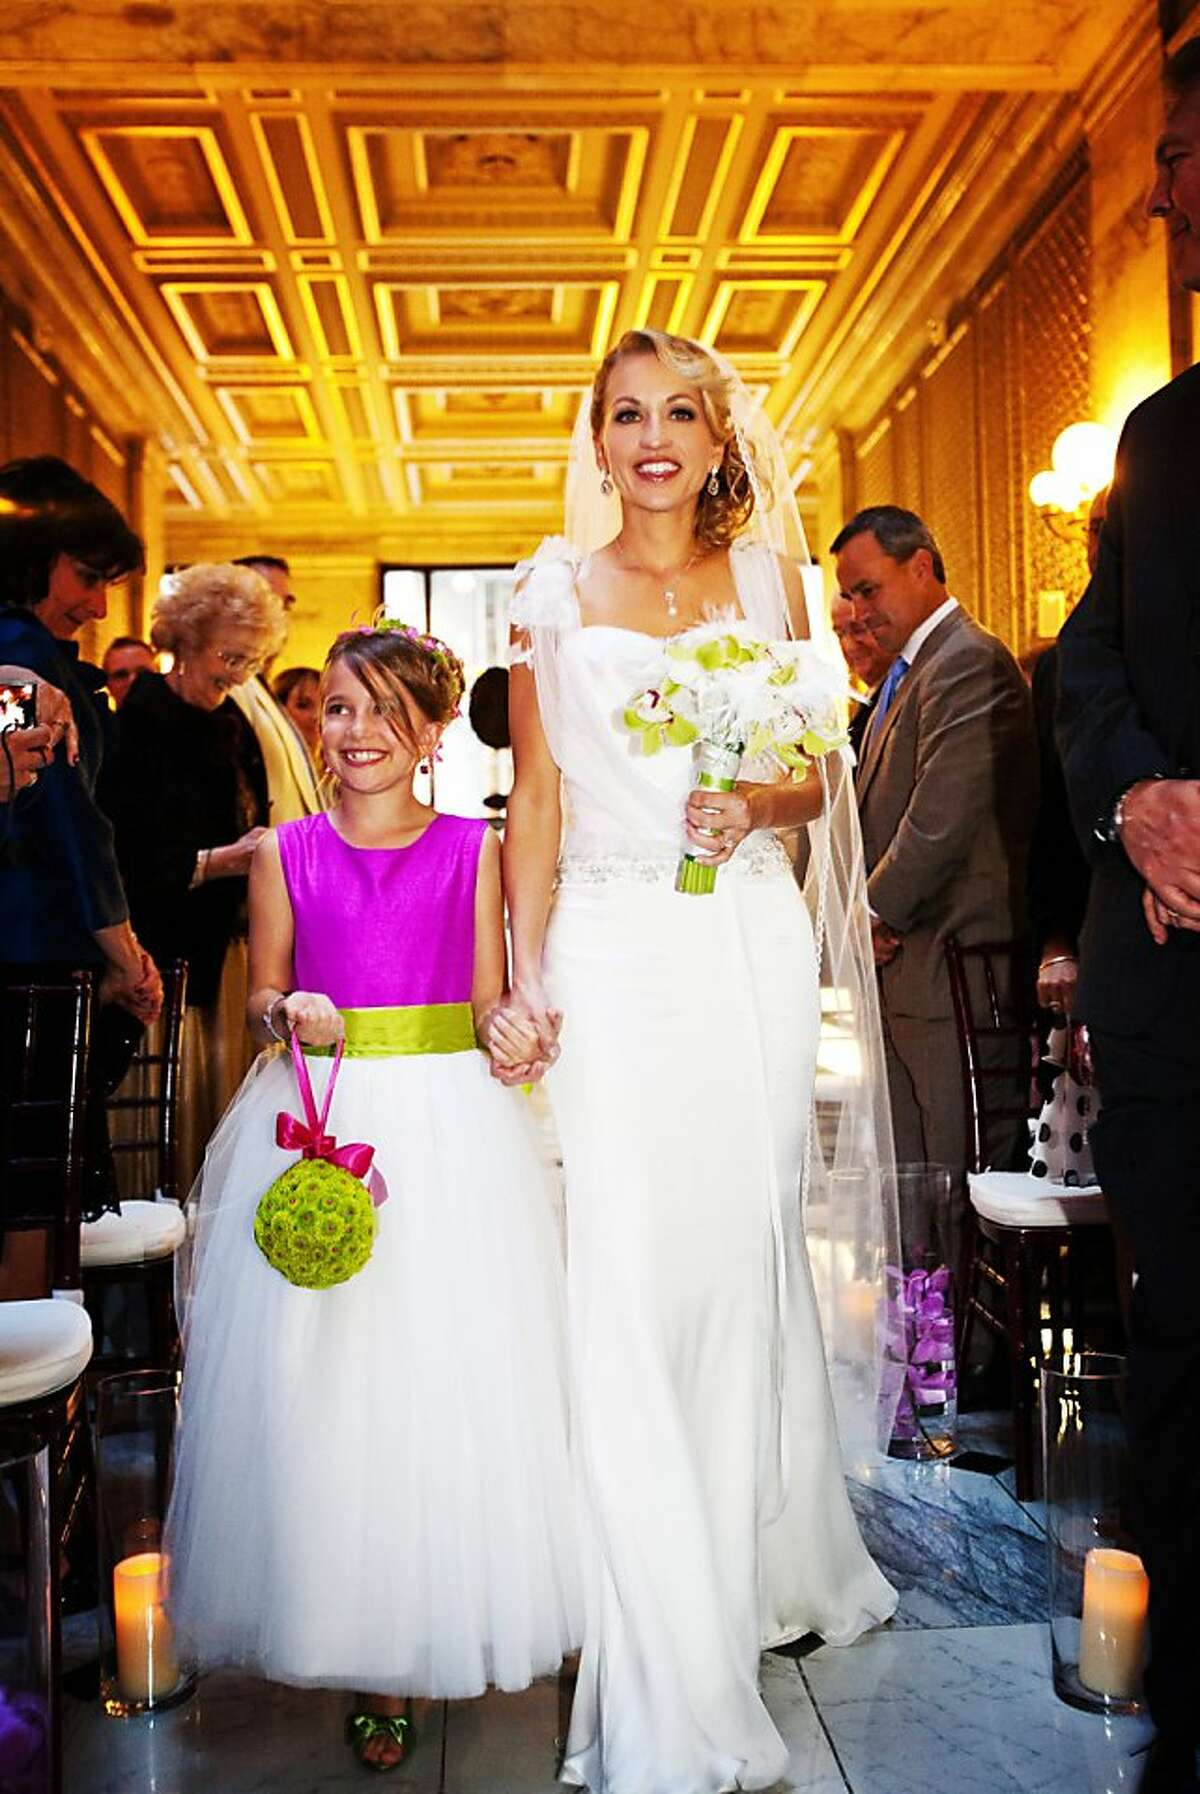 Images from the wedding of Andrea Boye and Scott Sieczkarek at the Julian Morgan Ballroom, 2011.